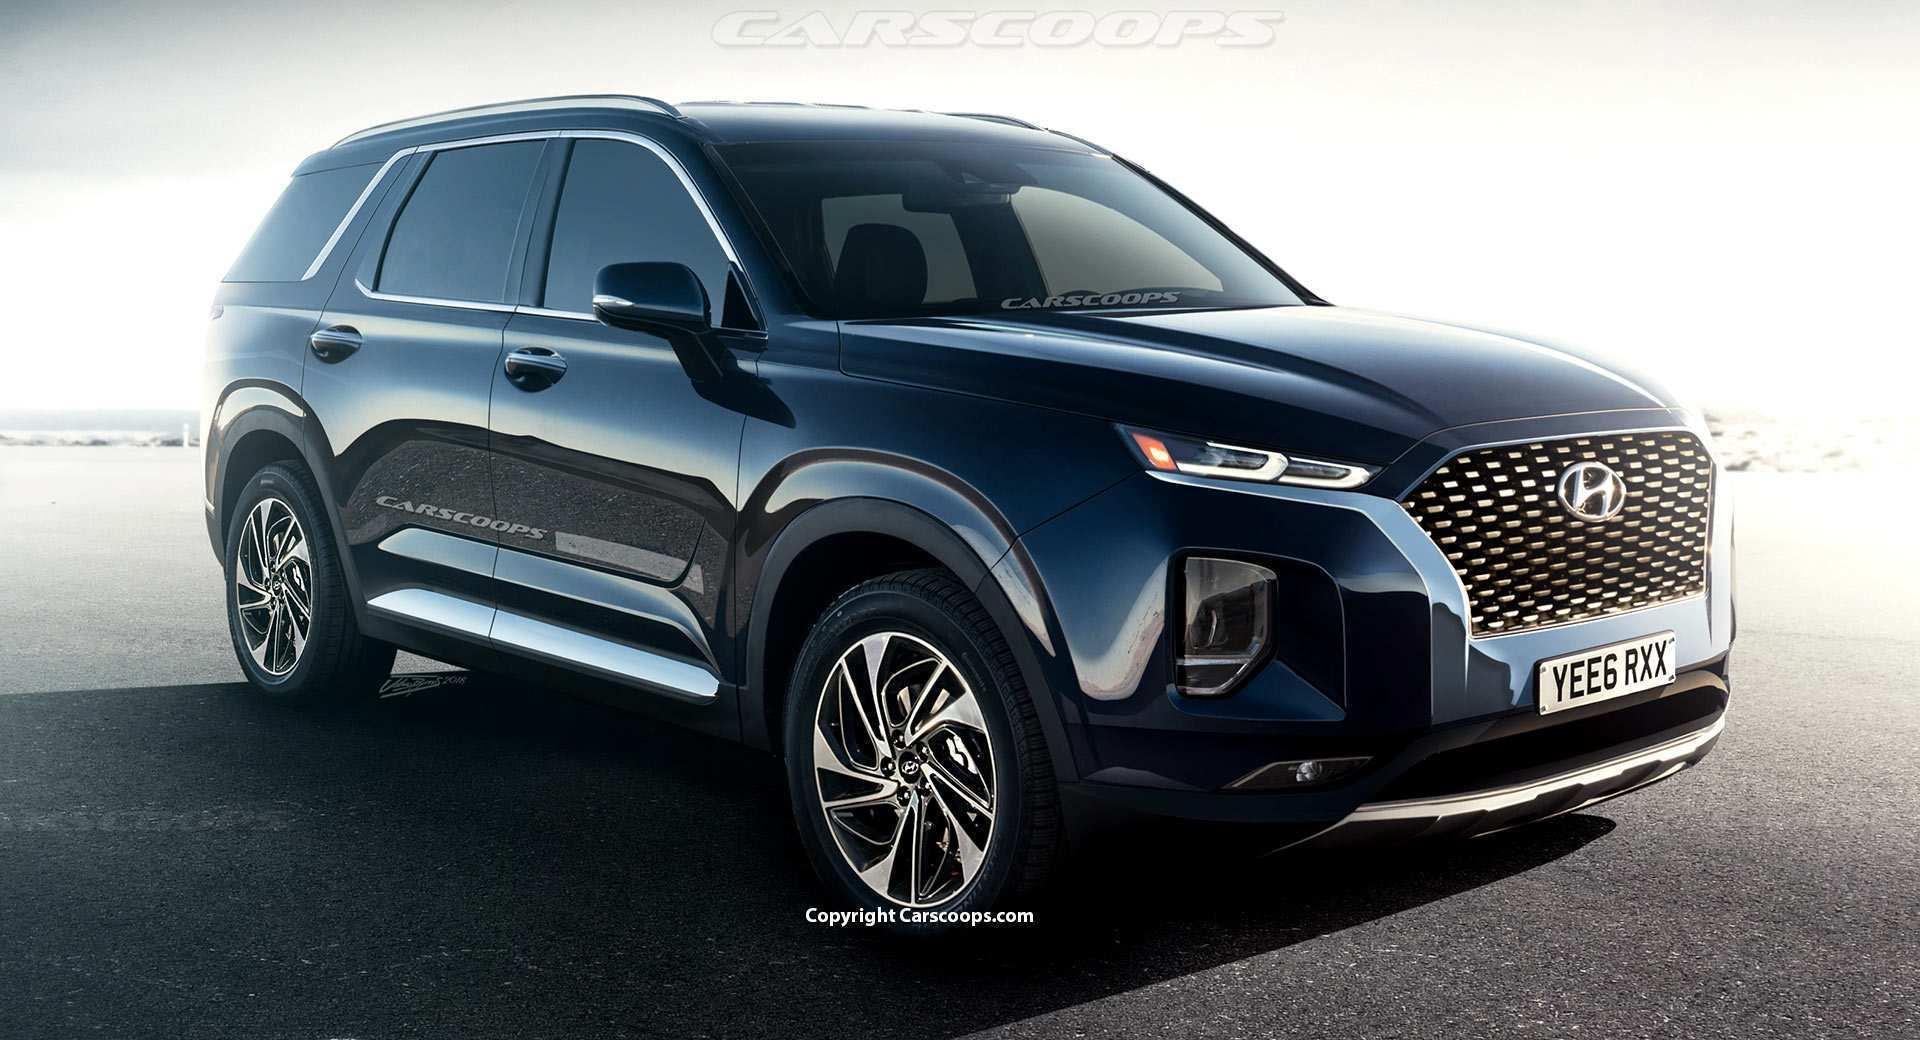 73 All New Hyundai 2020 Vision Specs and Review with Hyundai 2020 Vision